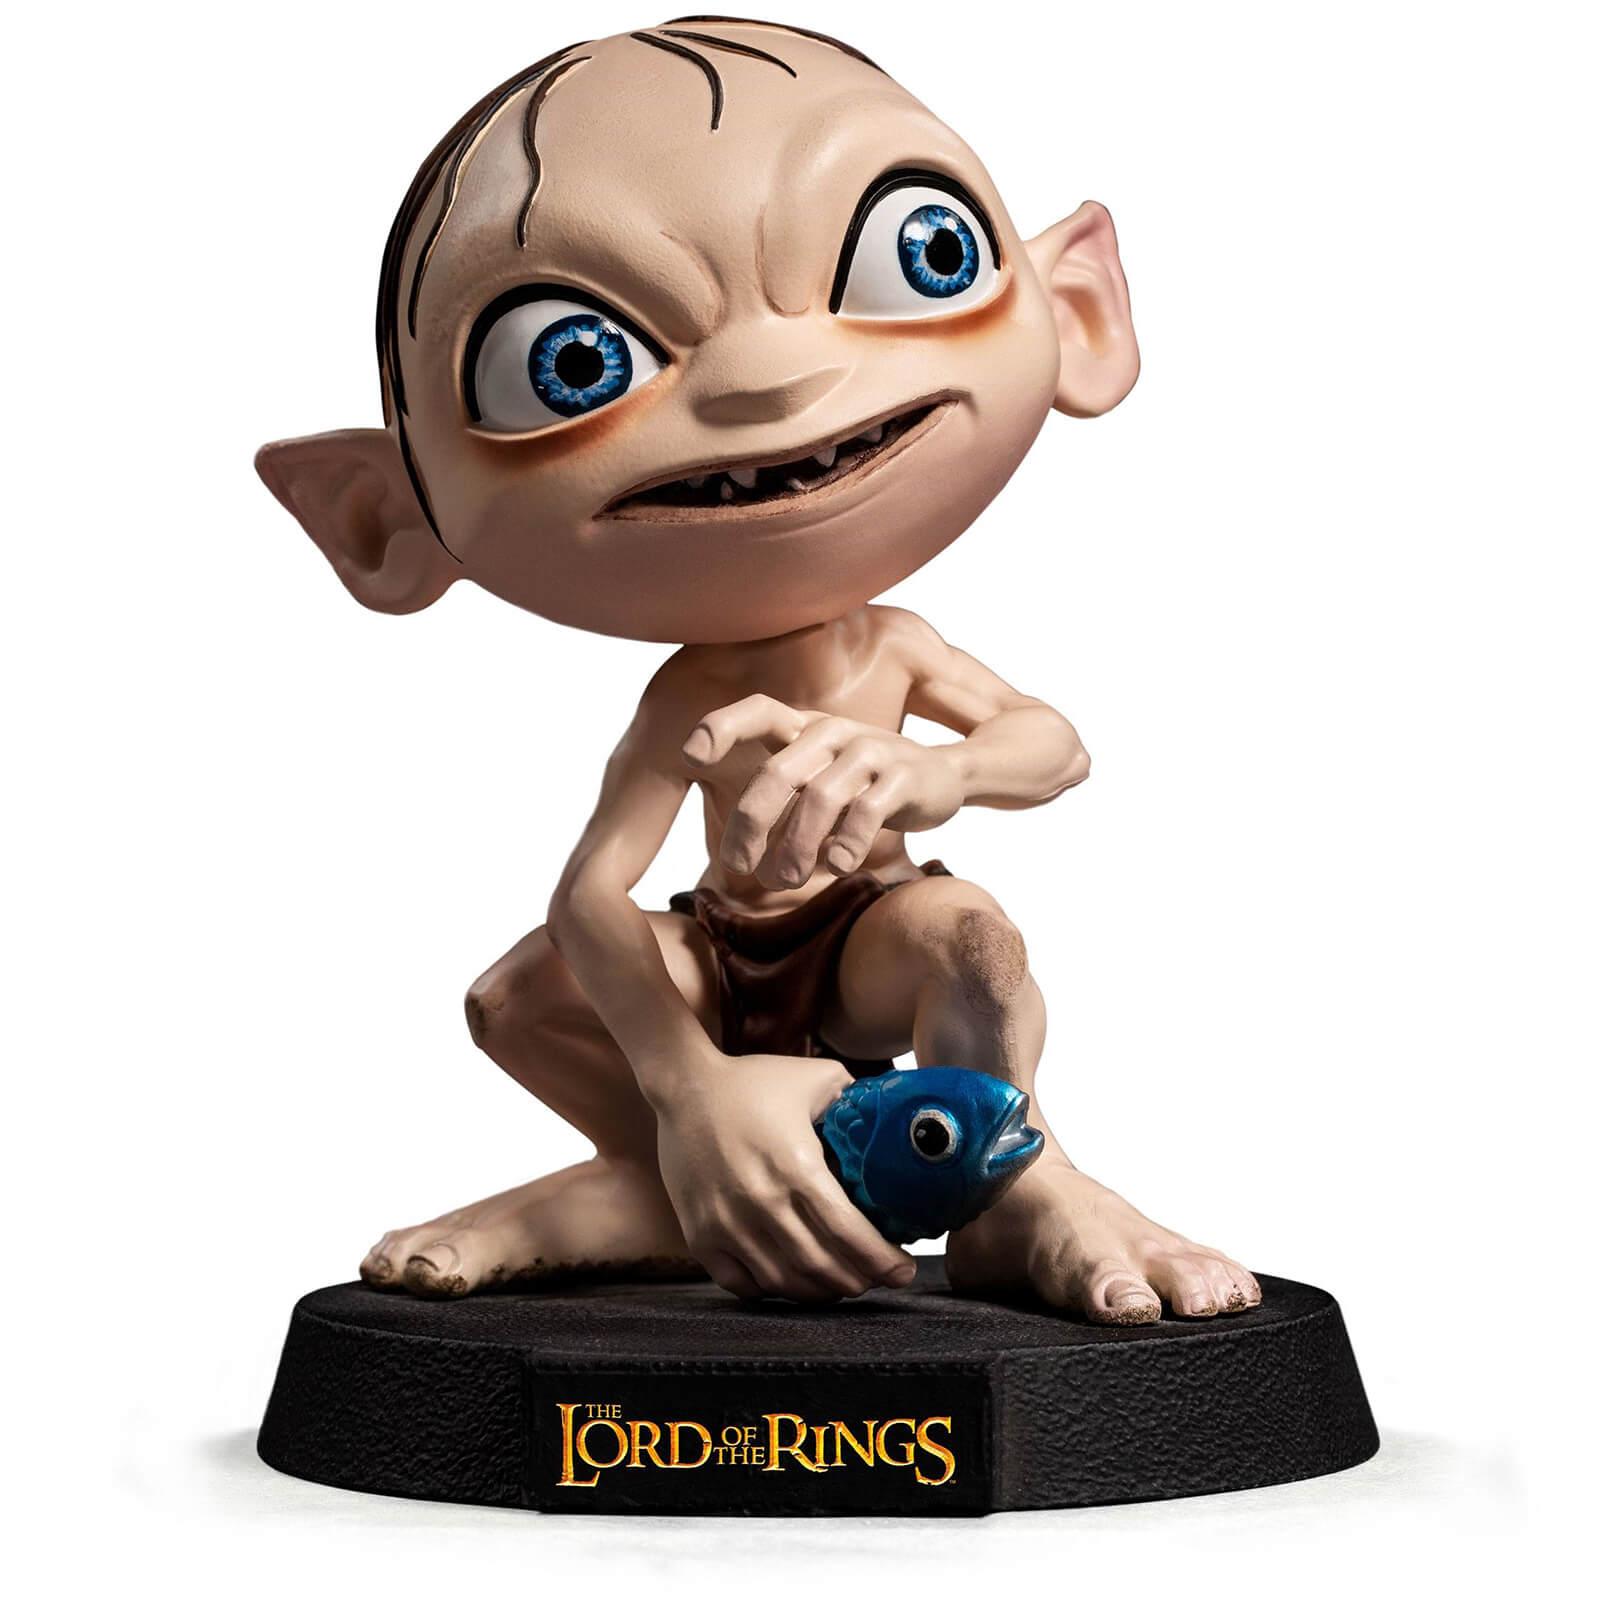 Image of Iron Studios Lord of the Rings Mini Co. PVC Figure Gollum 9 cm